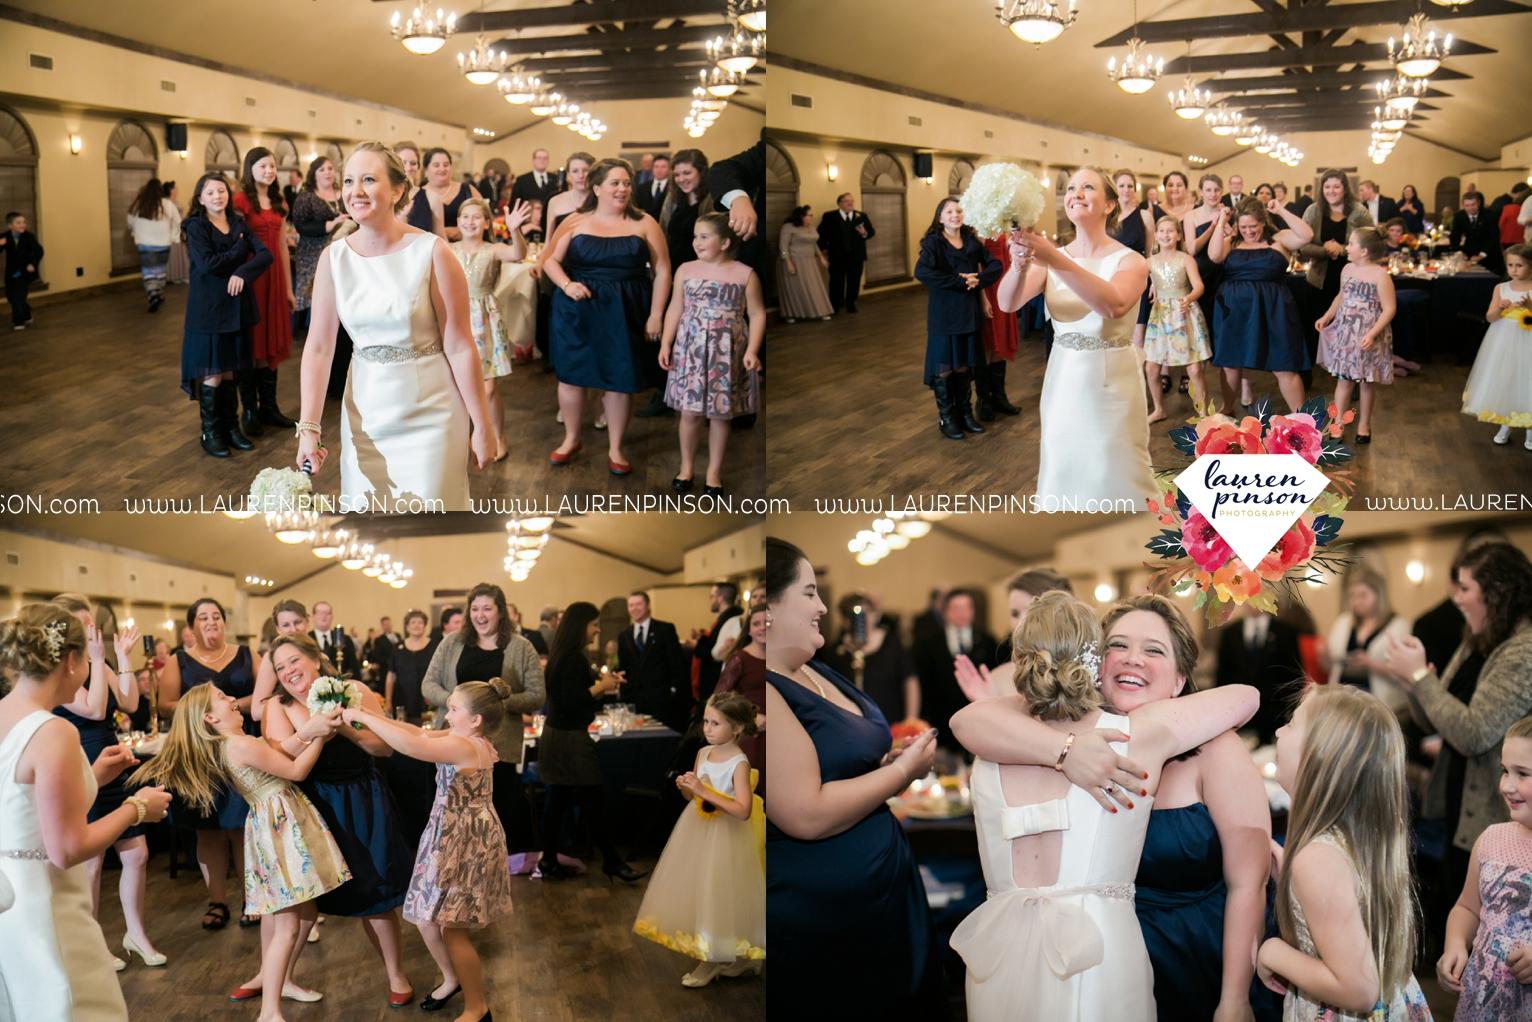 bells-texas-wedding-photography-at-willowood-ranch-chapel-north-texas-wichita-falls-wedding-photographer_1901.jpg